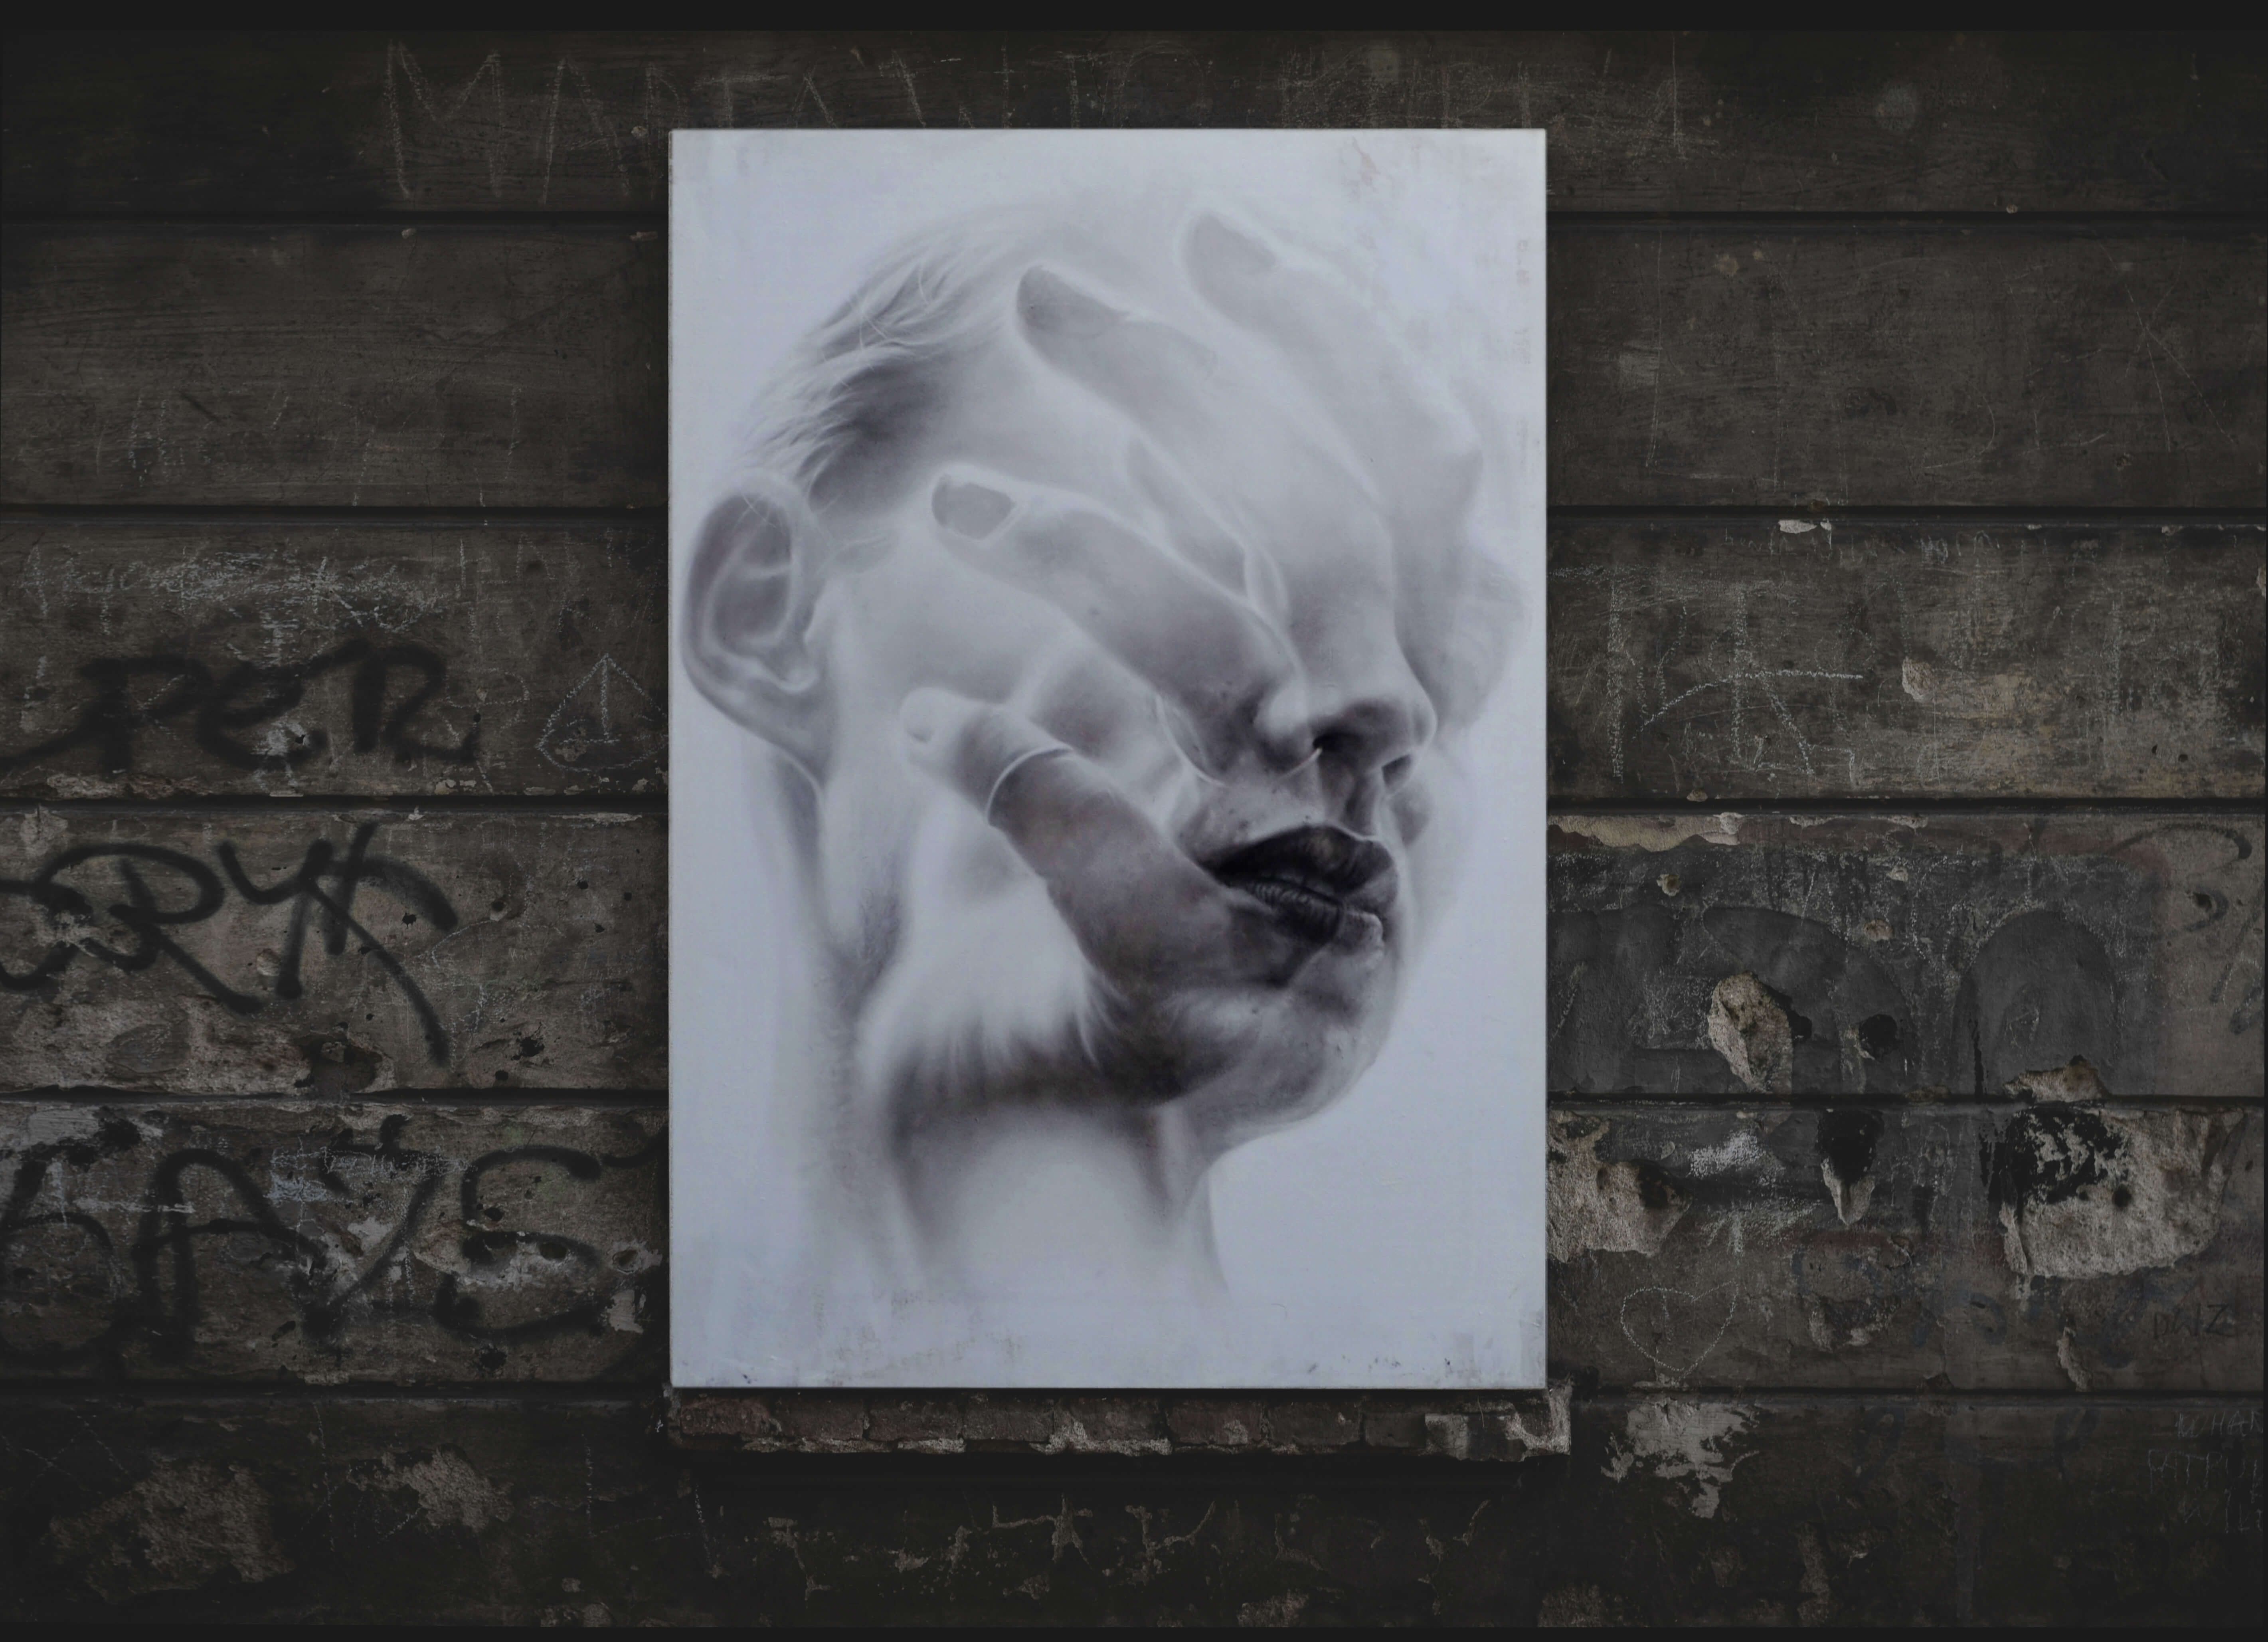 Oil painting title '' Fragile '' • Dimensions 150 X 105 X 7cm / Oil on Plywood • Weight 15 Kg • Sold • Owner: @kamilalochert  #art #streetart #painting #blackandwhite #fineart #artwork #drawing #creative #arte #portrait #theartshed #magicgallery #details #church #aartistic_dreamers #doublexposure #facepaint #feeling #naturepainting #spotlightonartist  #kunst #strassenkunst #modernekunst #spraypaint #urbanart #myart #newart #summerexhibition2017 #the_theclassyissue #summerexhibition…